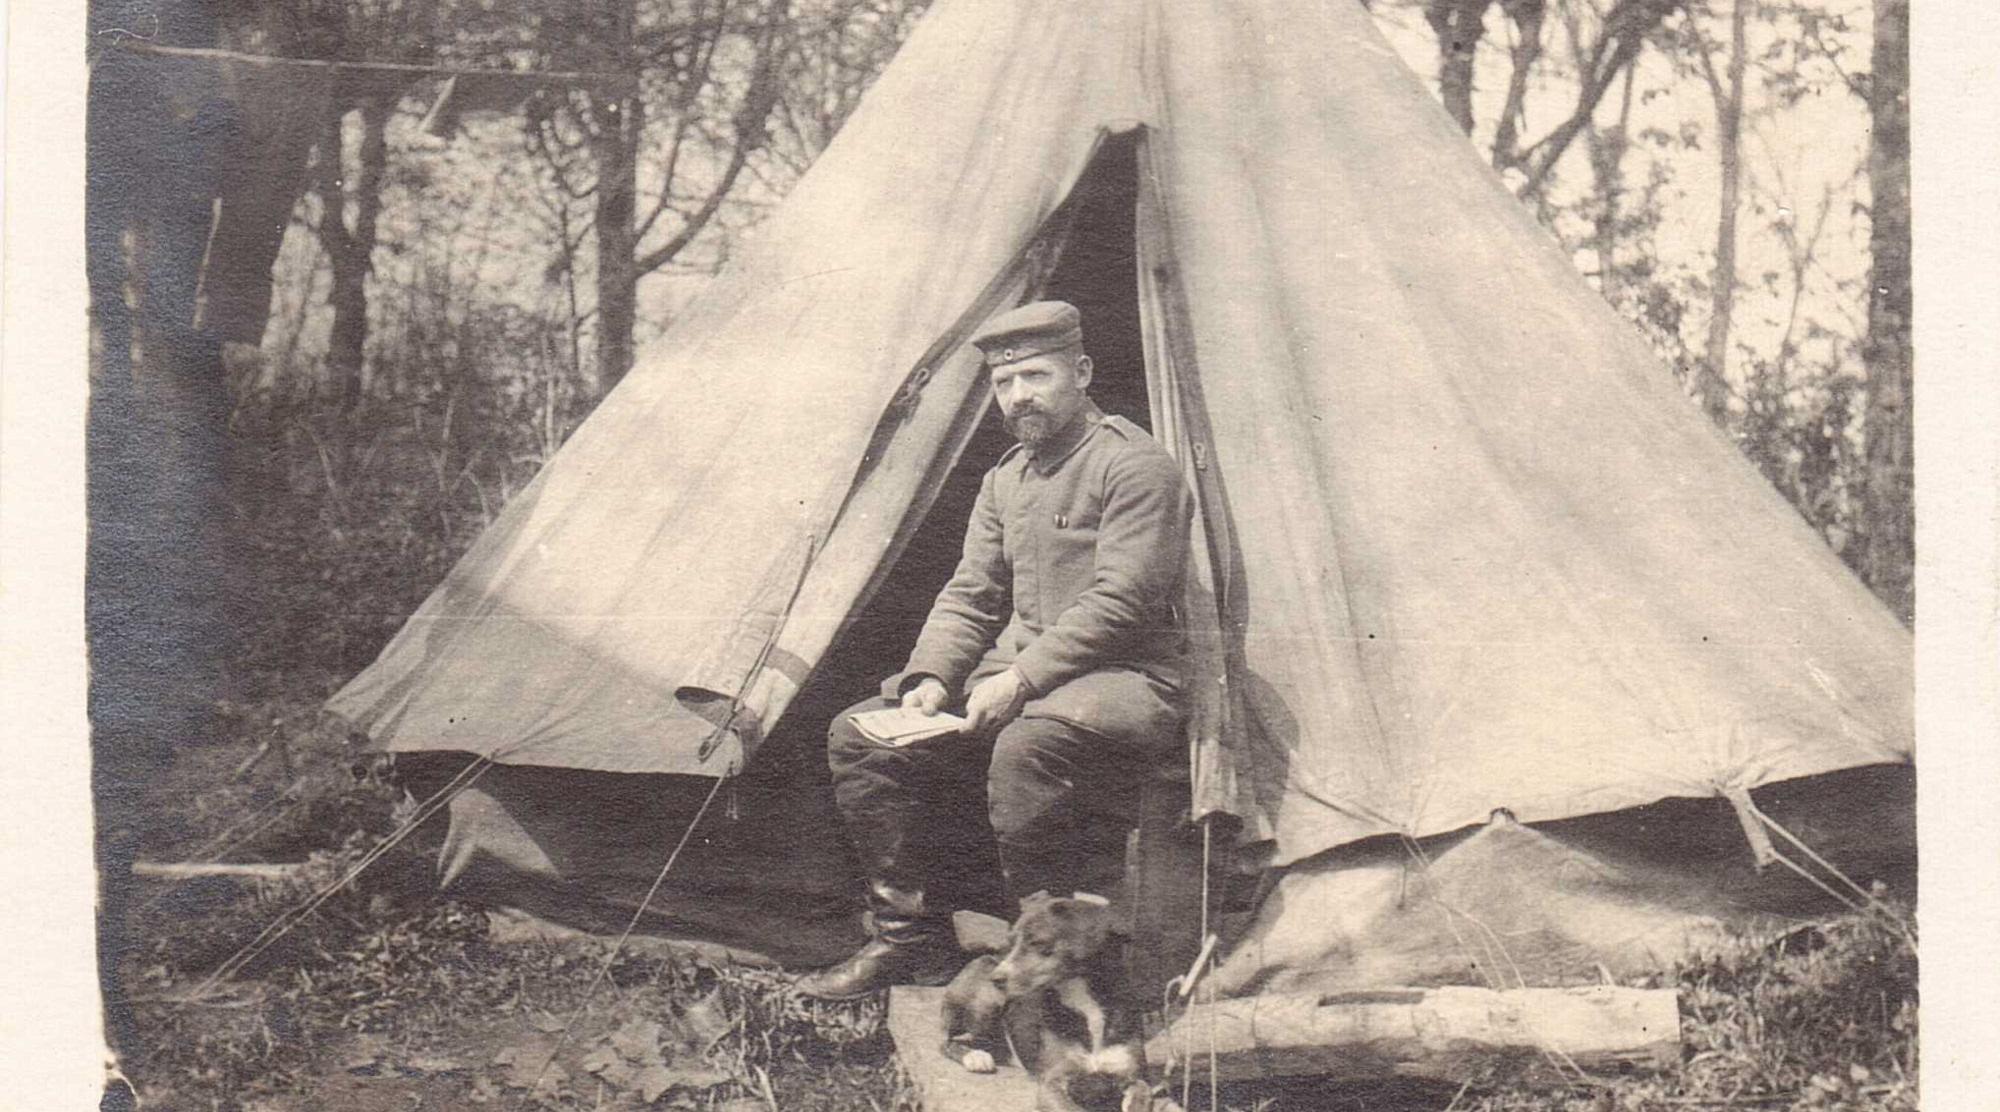 Historical tents - Tentorium - Anglo-Saxon Geteld historical tent soldier tents linen tents medieval tents cone tents Market-tents Vikings tents ... & Historical tents - Tentorium - Anglo-Saxon Geteld historical ...